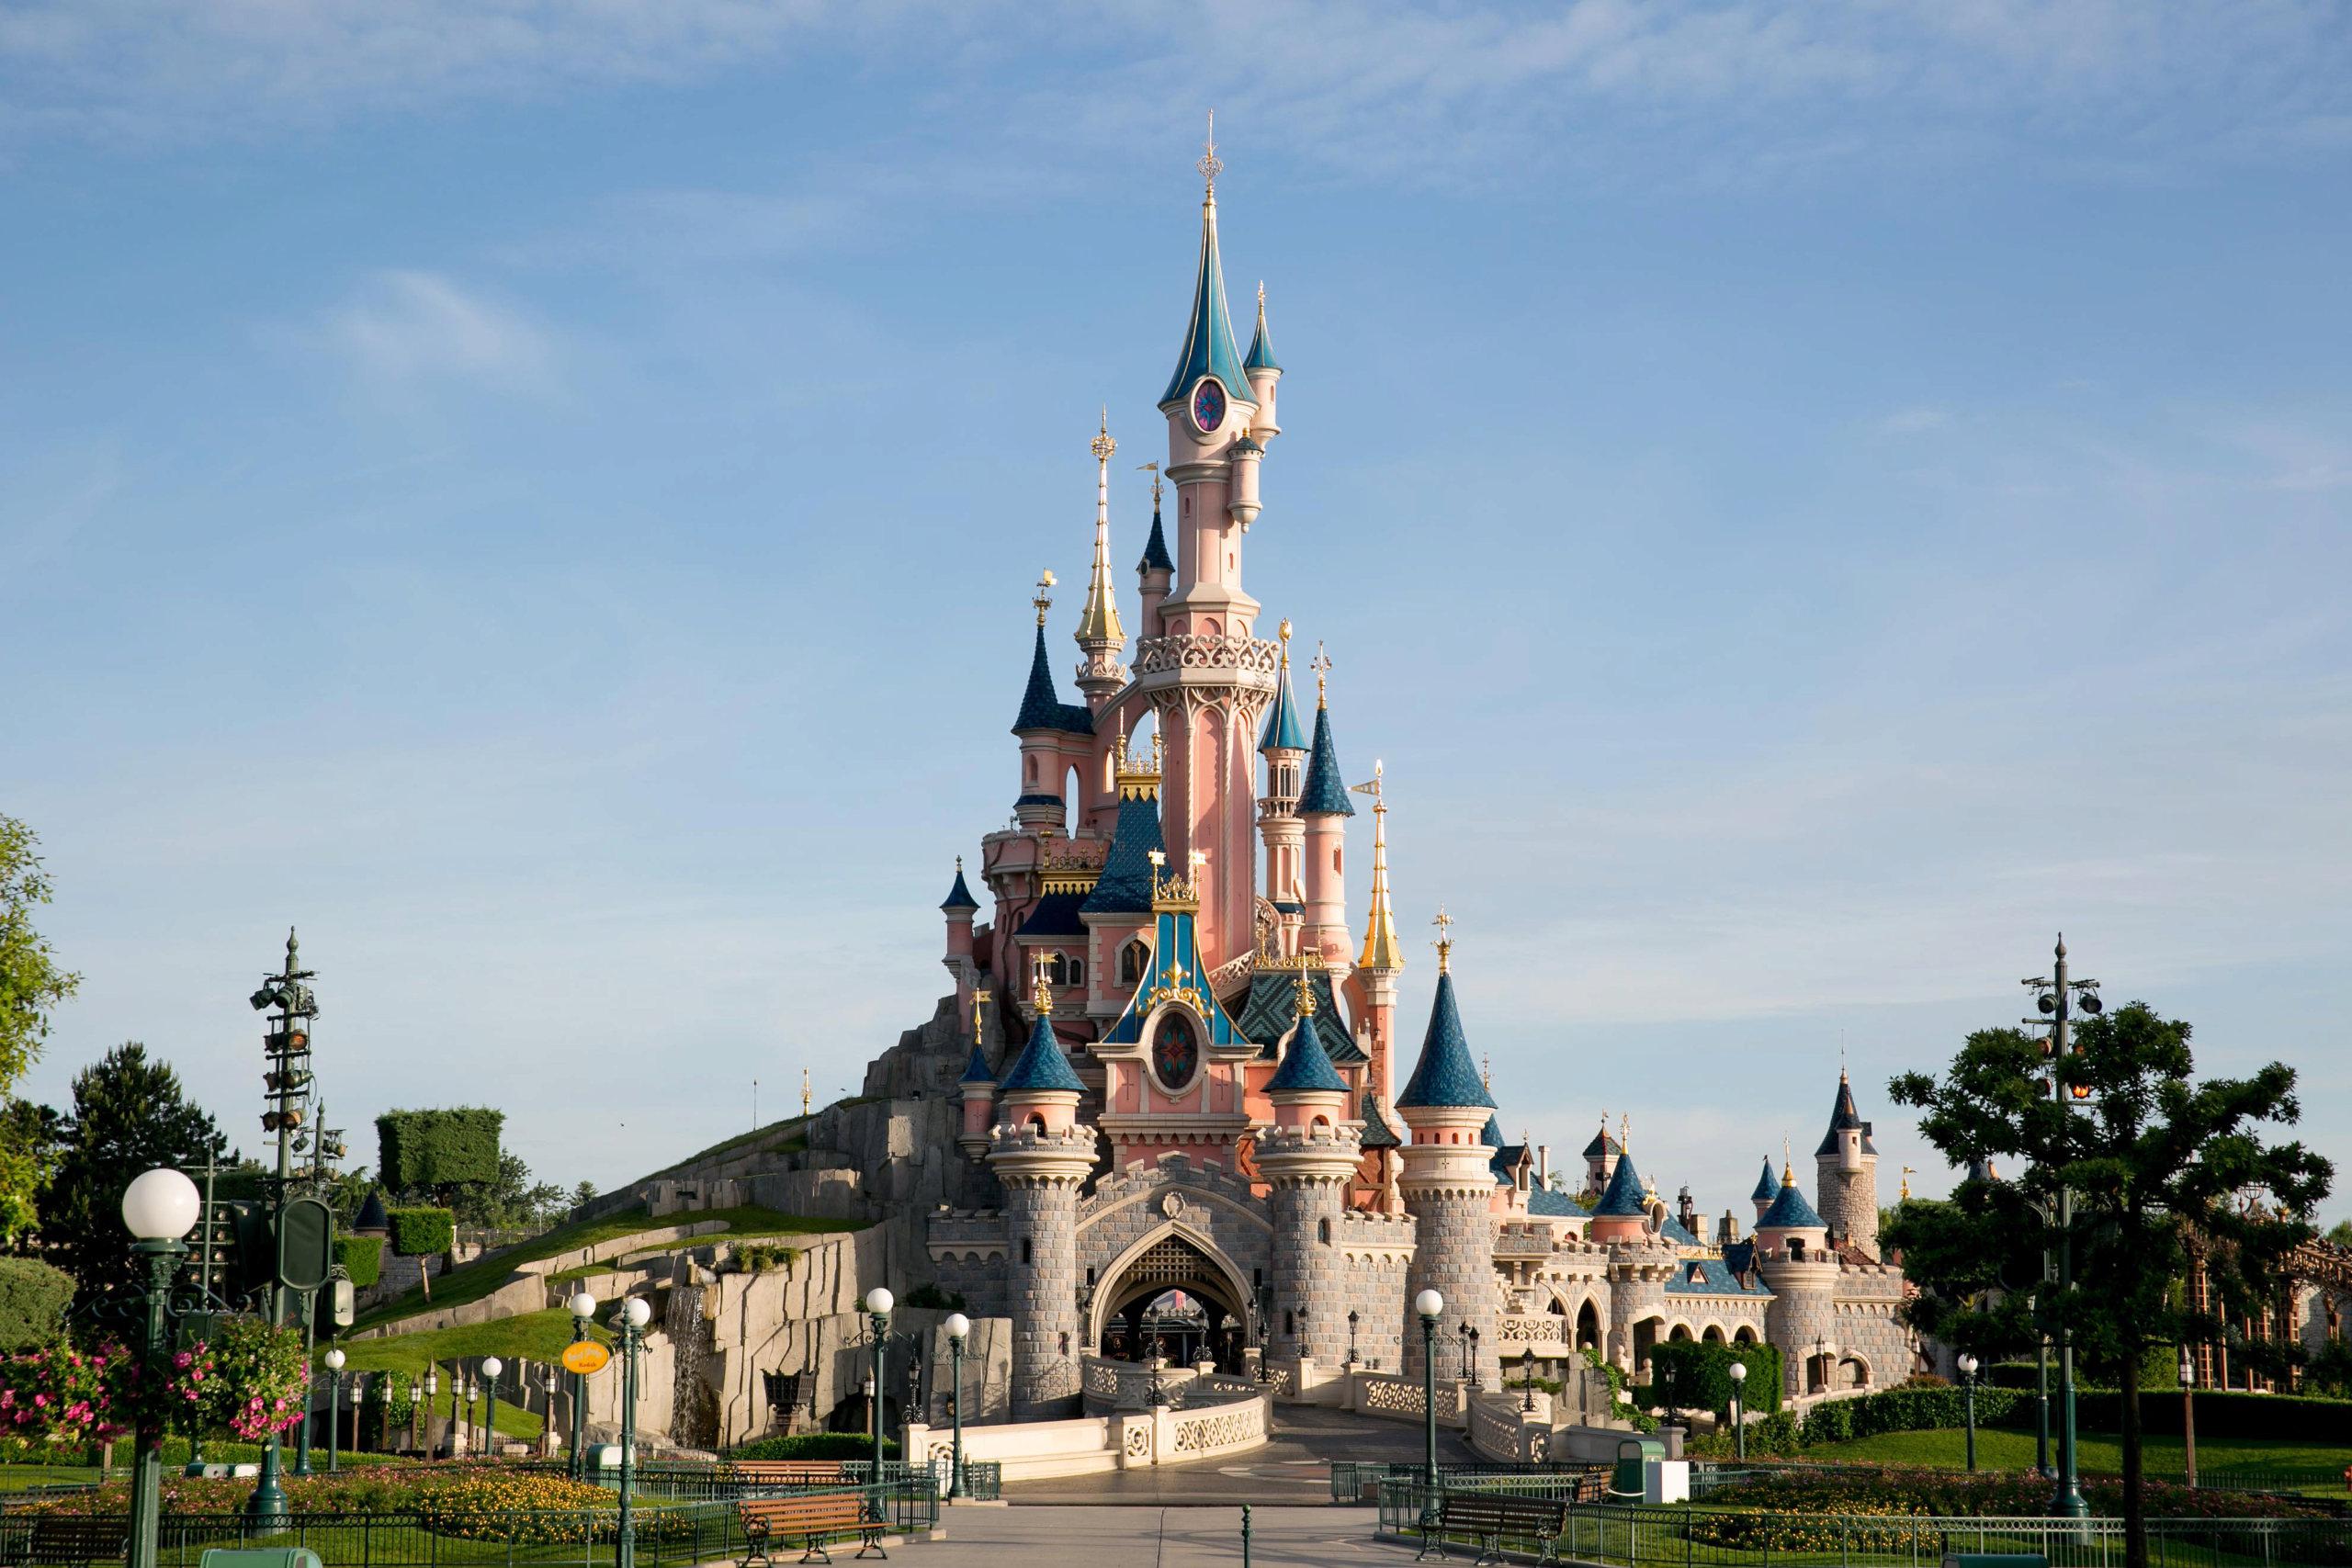 Riapertura di Disneyland Paris - Pagina 2 Sleepi12